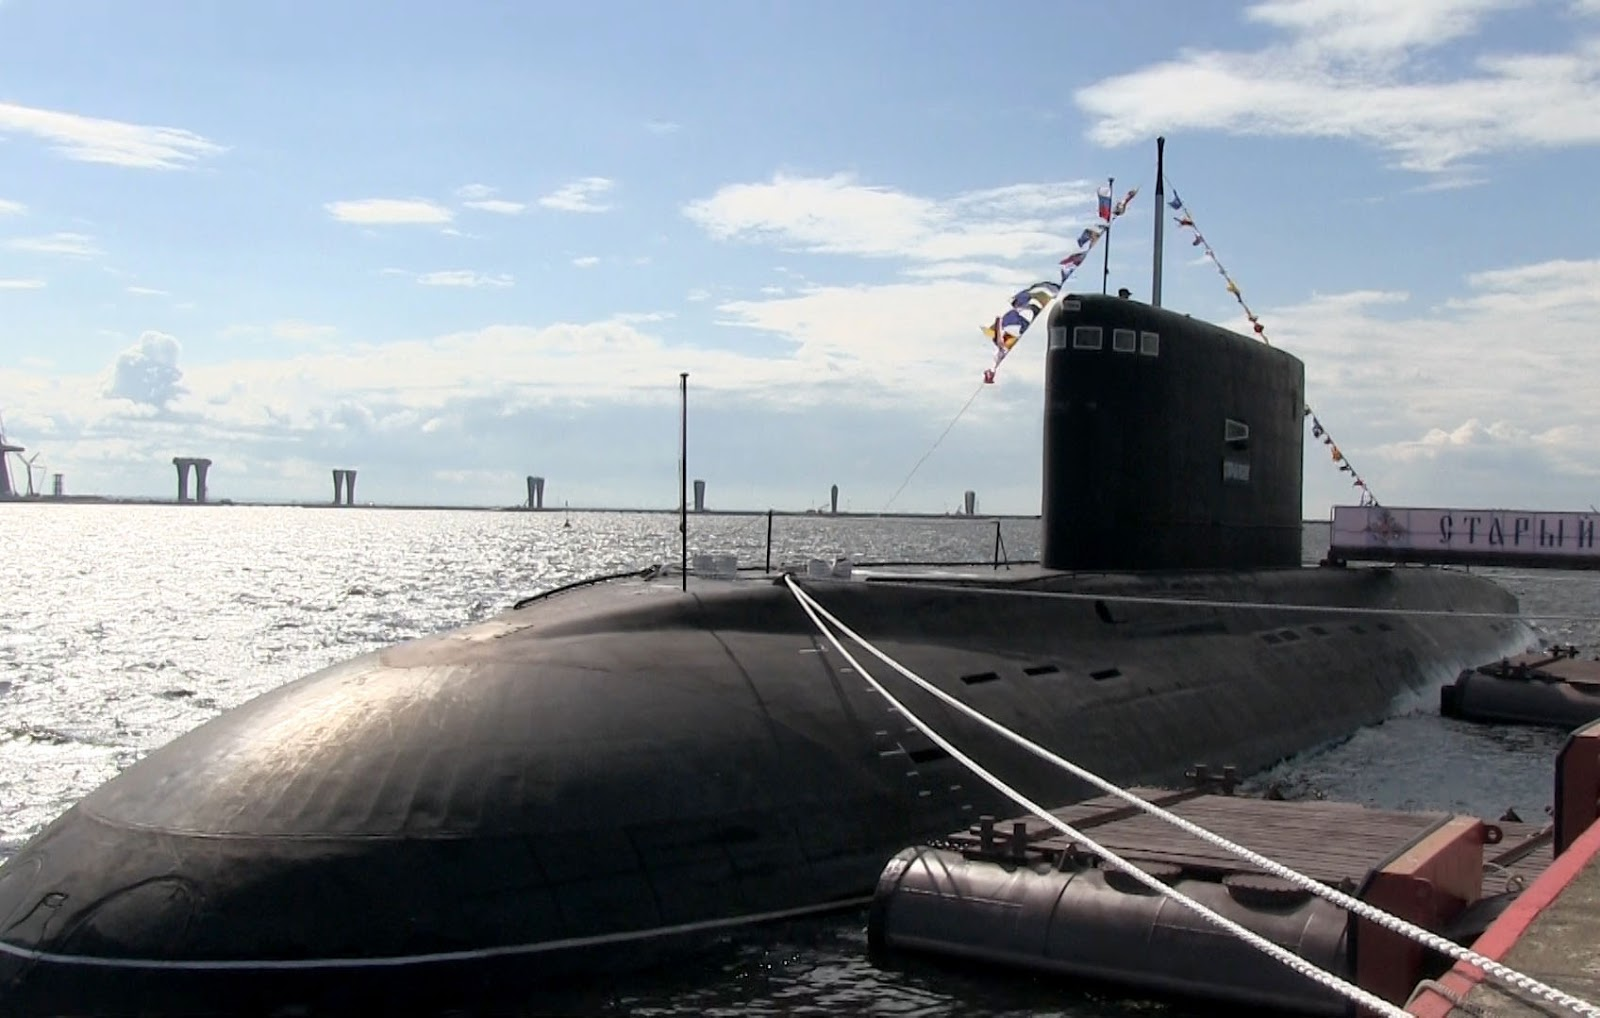 Kapal Selam Kilo Project 636